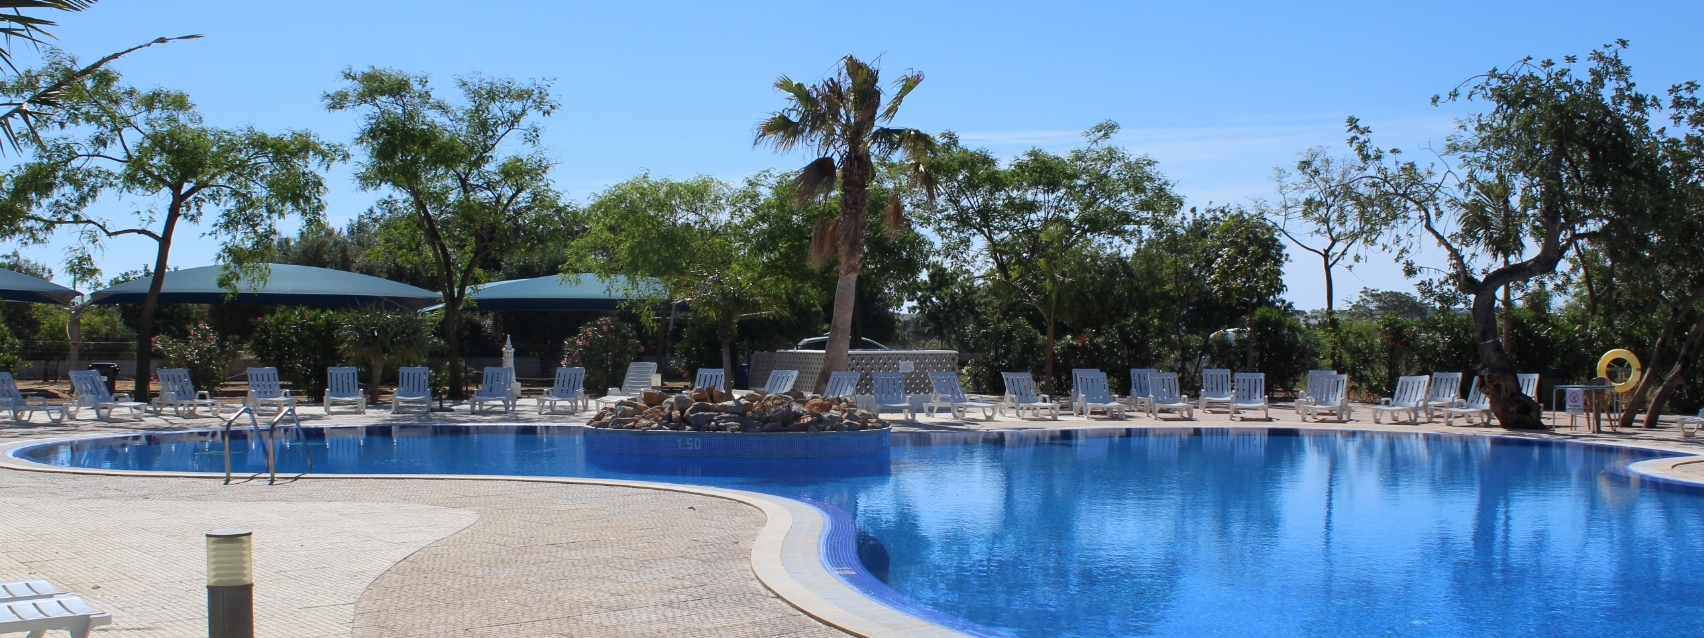 About Camping Ria Formosa - Algarve - Big Campsite near the beach - bungalows - tendas - mobile homes